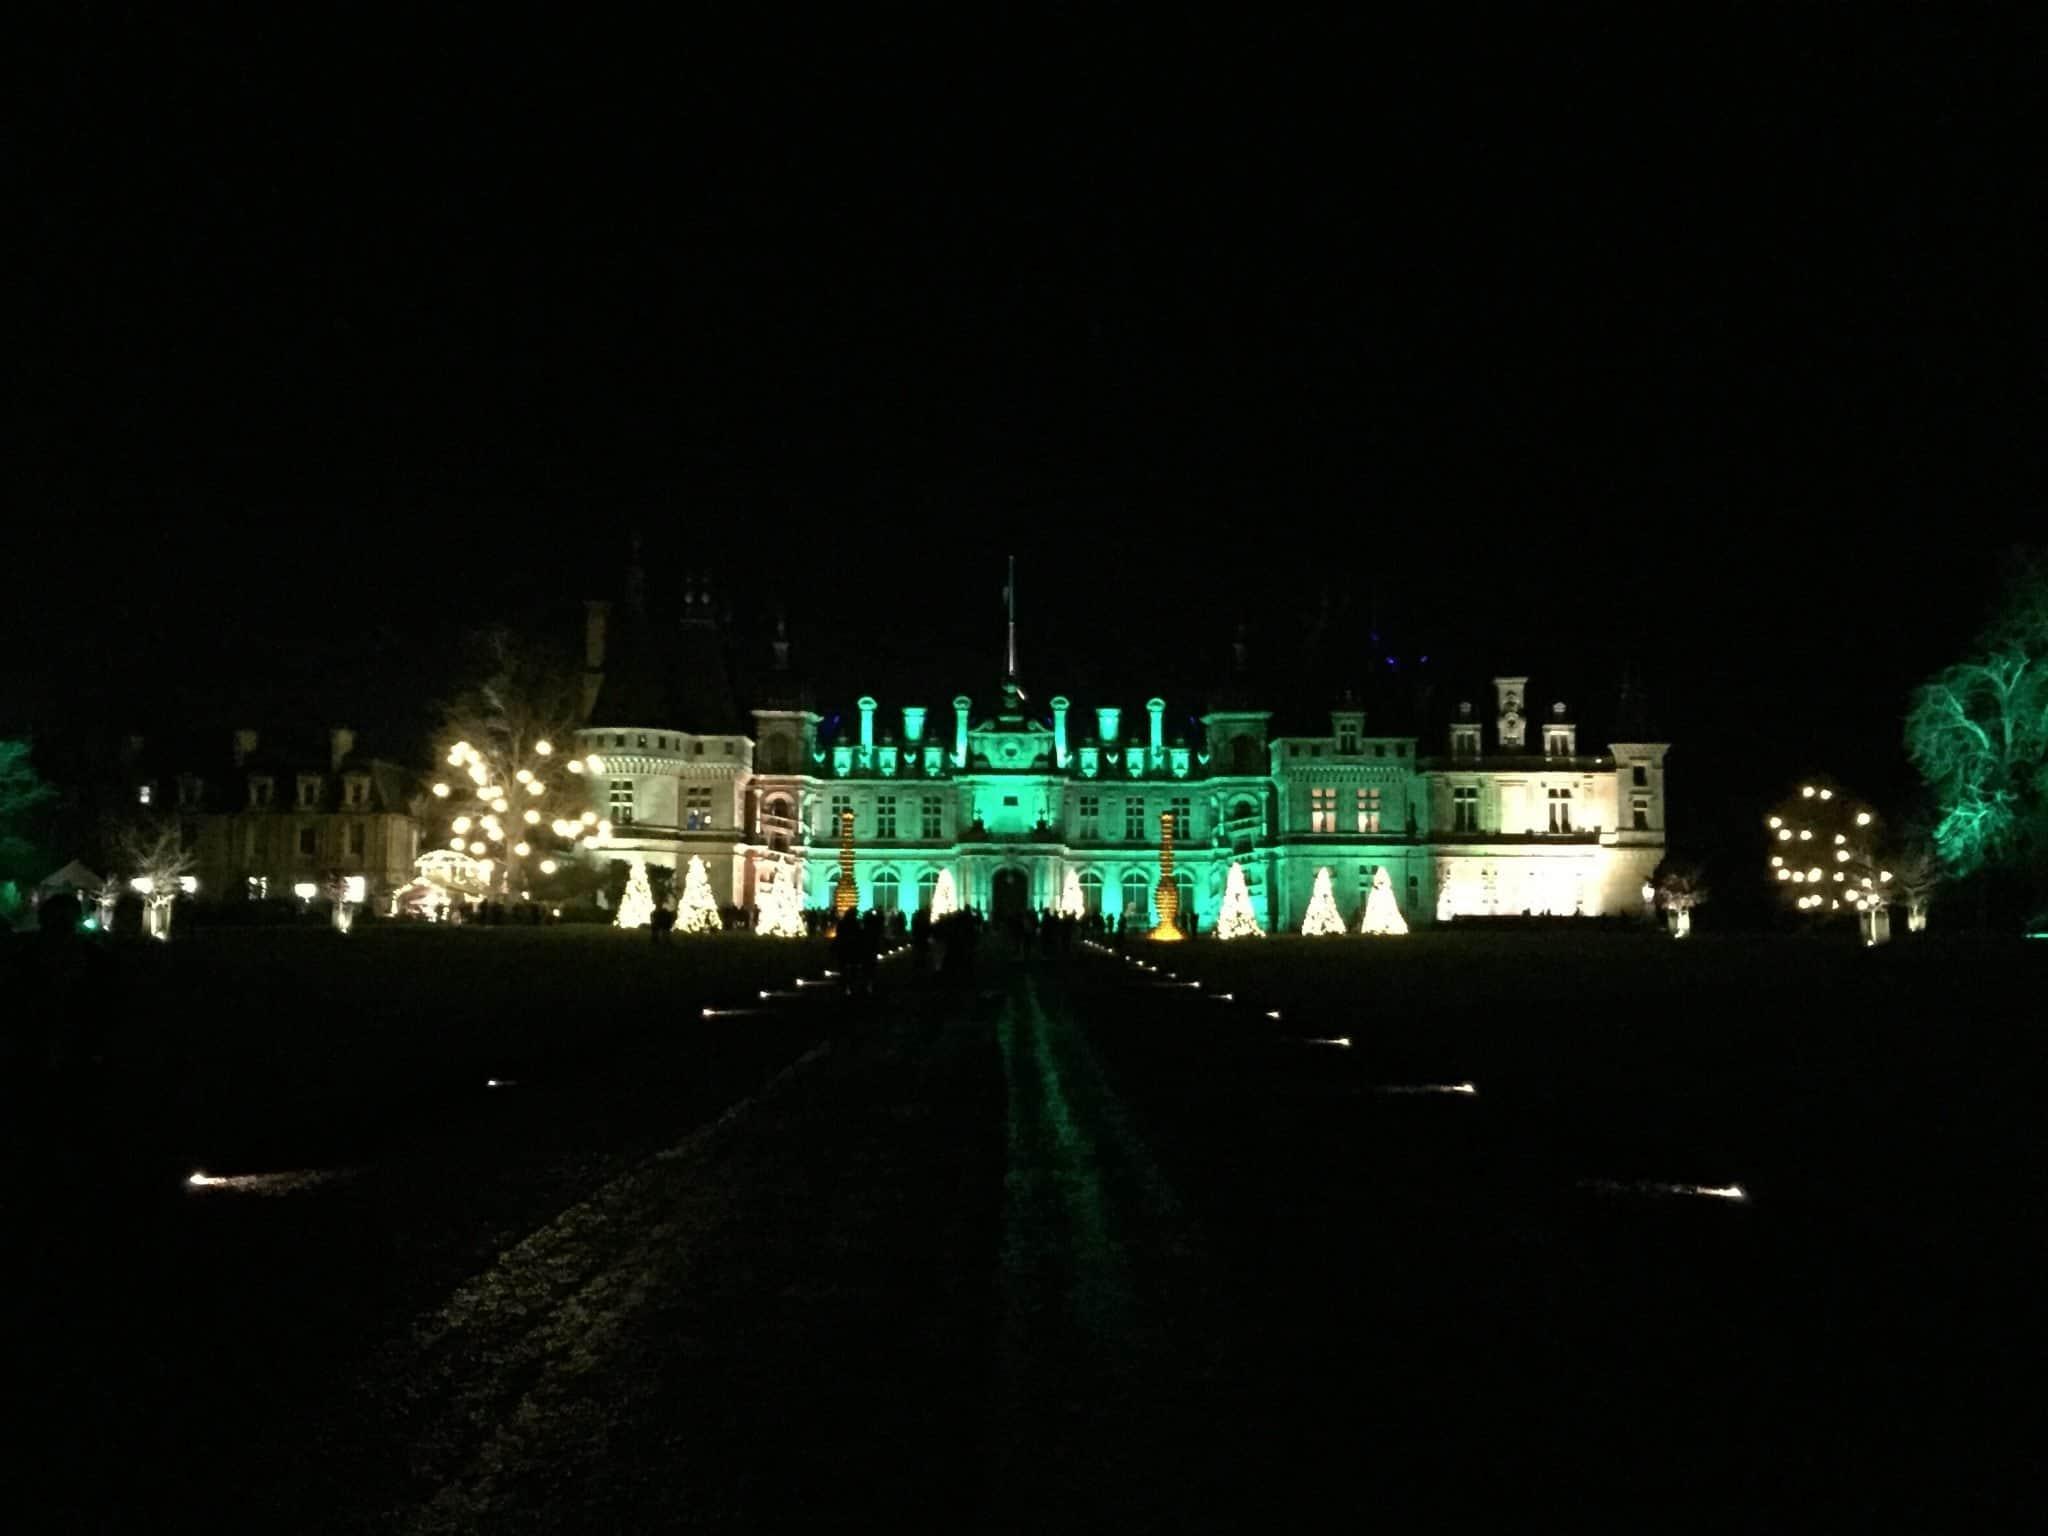 Waddesdon Manor lit up, by night